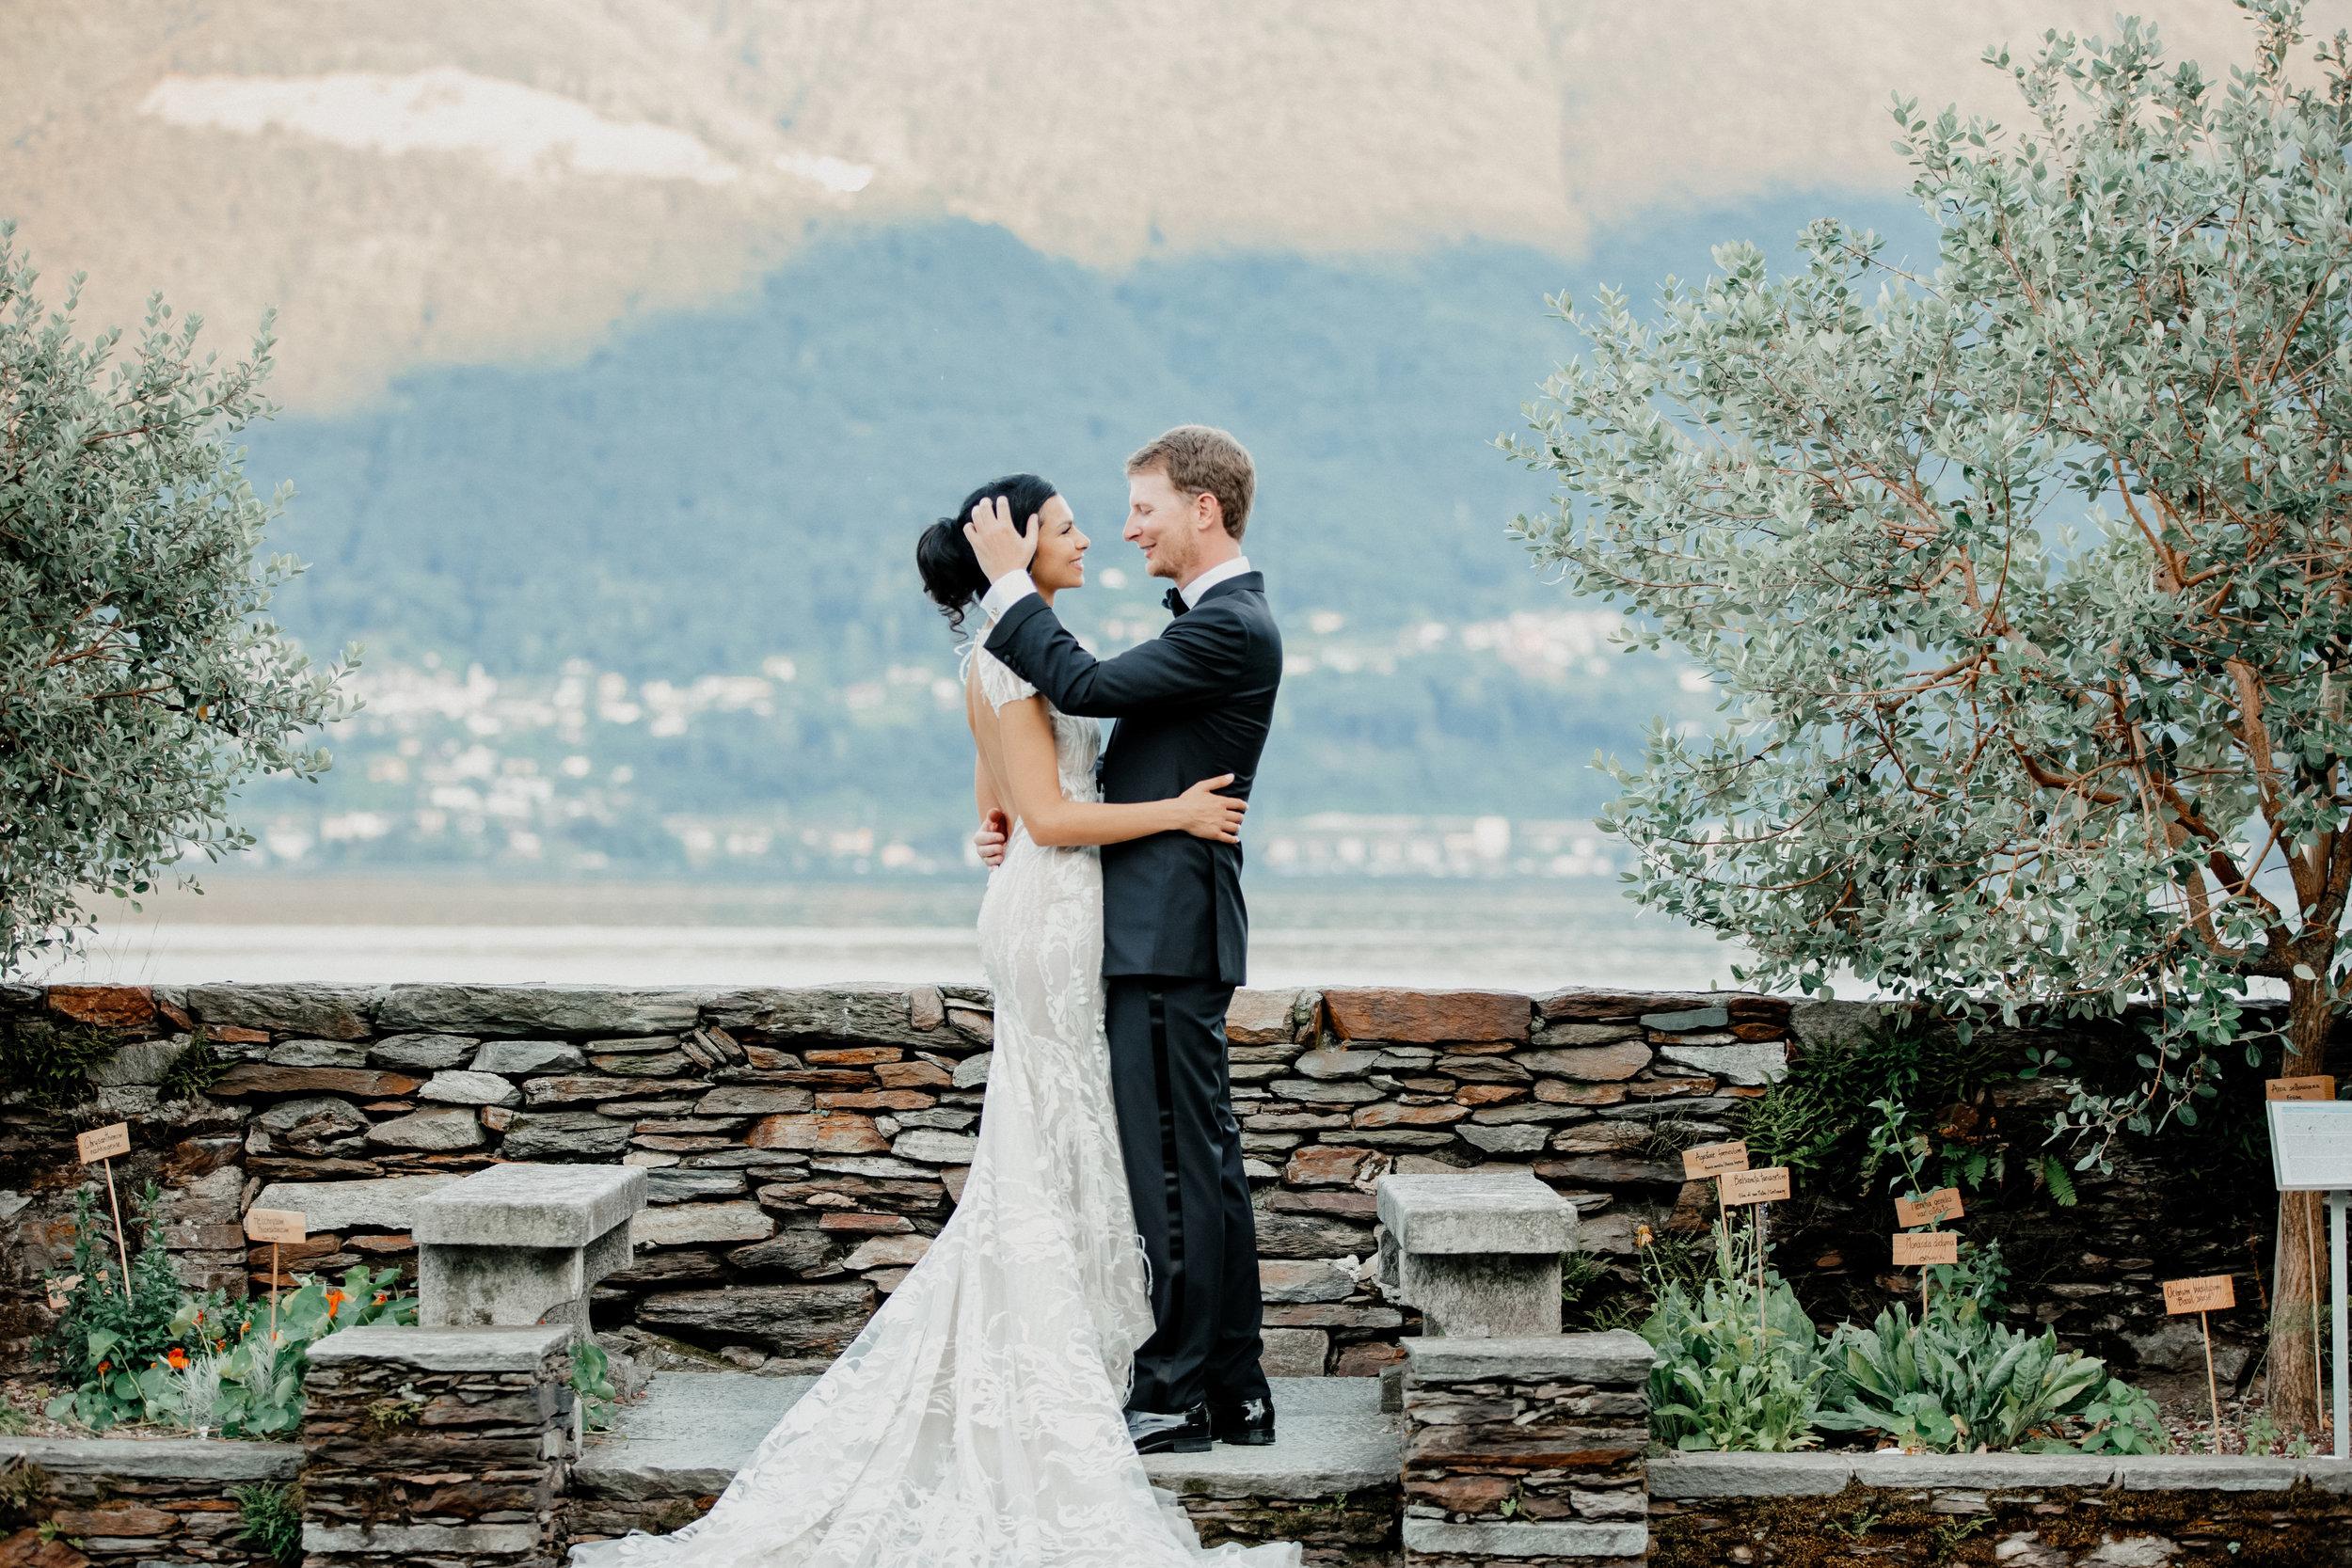 180707-preview-105-Marina-Fadeeva-wedding-photographer.jpg